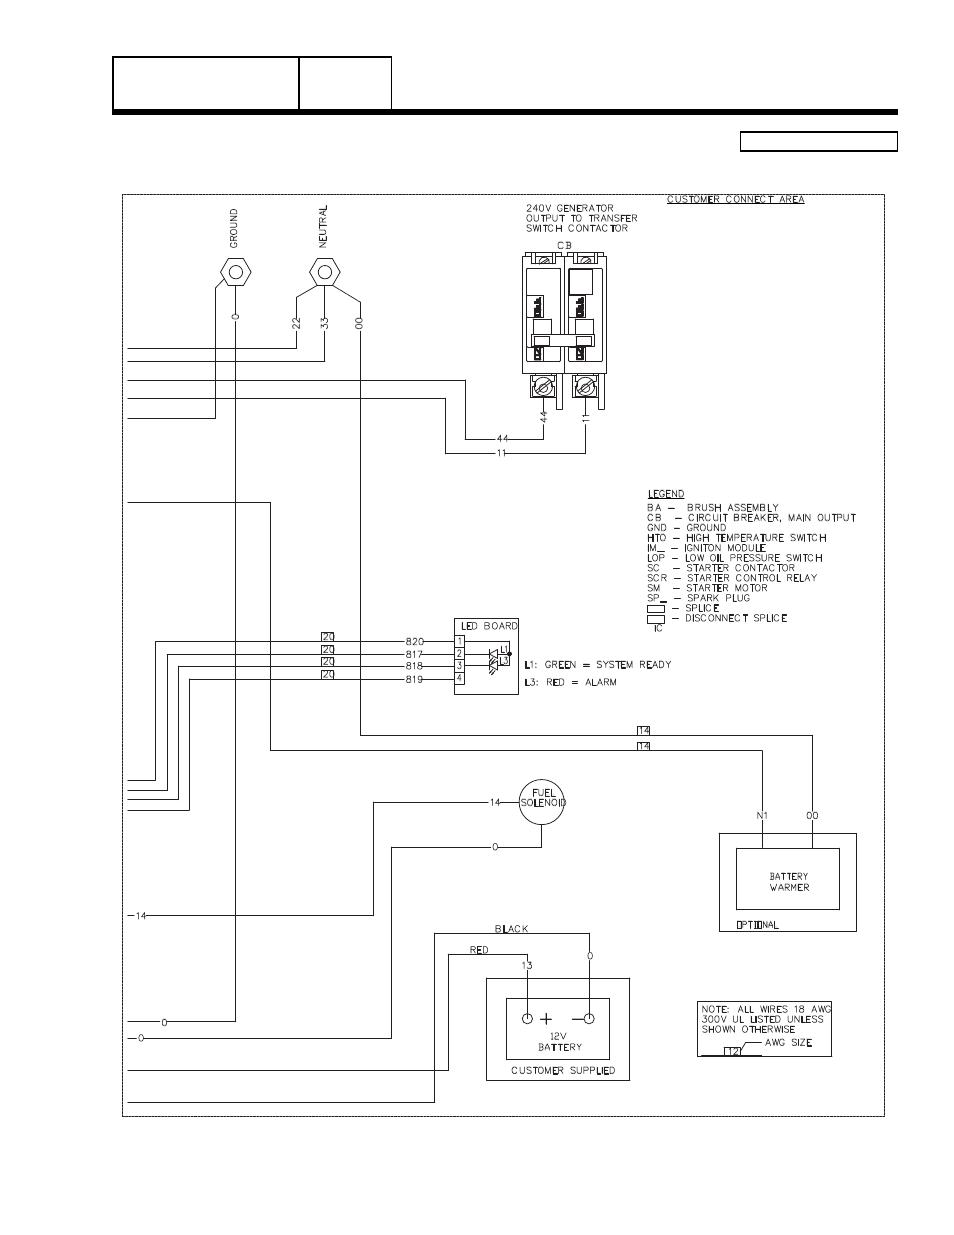 medium resolution of 8 kw generac wiring diagram wiring diagram origin northstar wiring diagram 10 kw generac wiring diagram